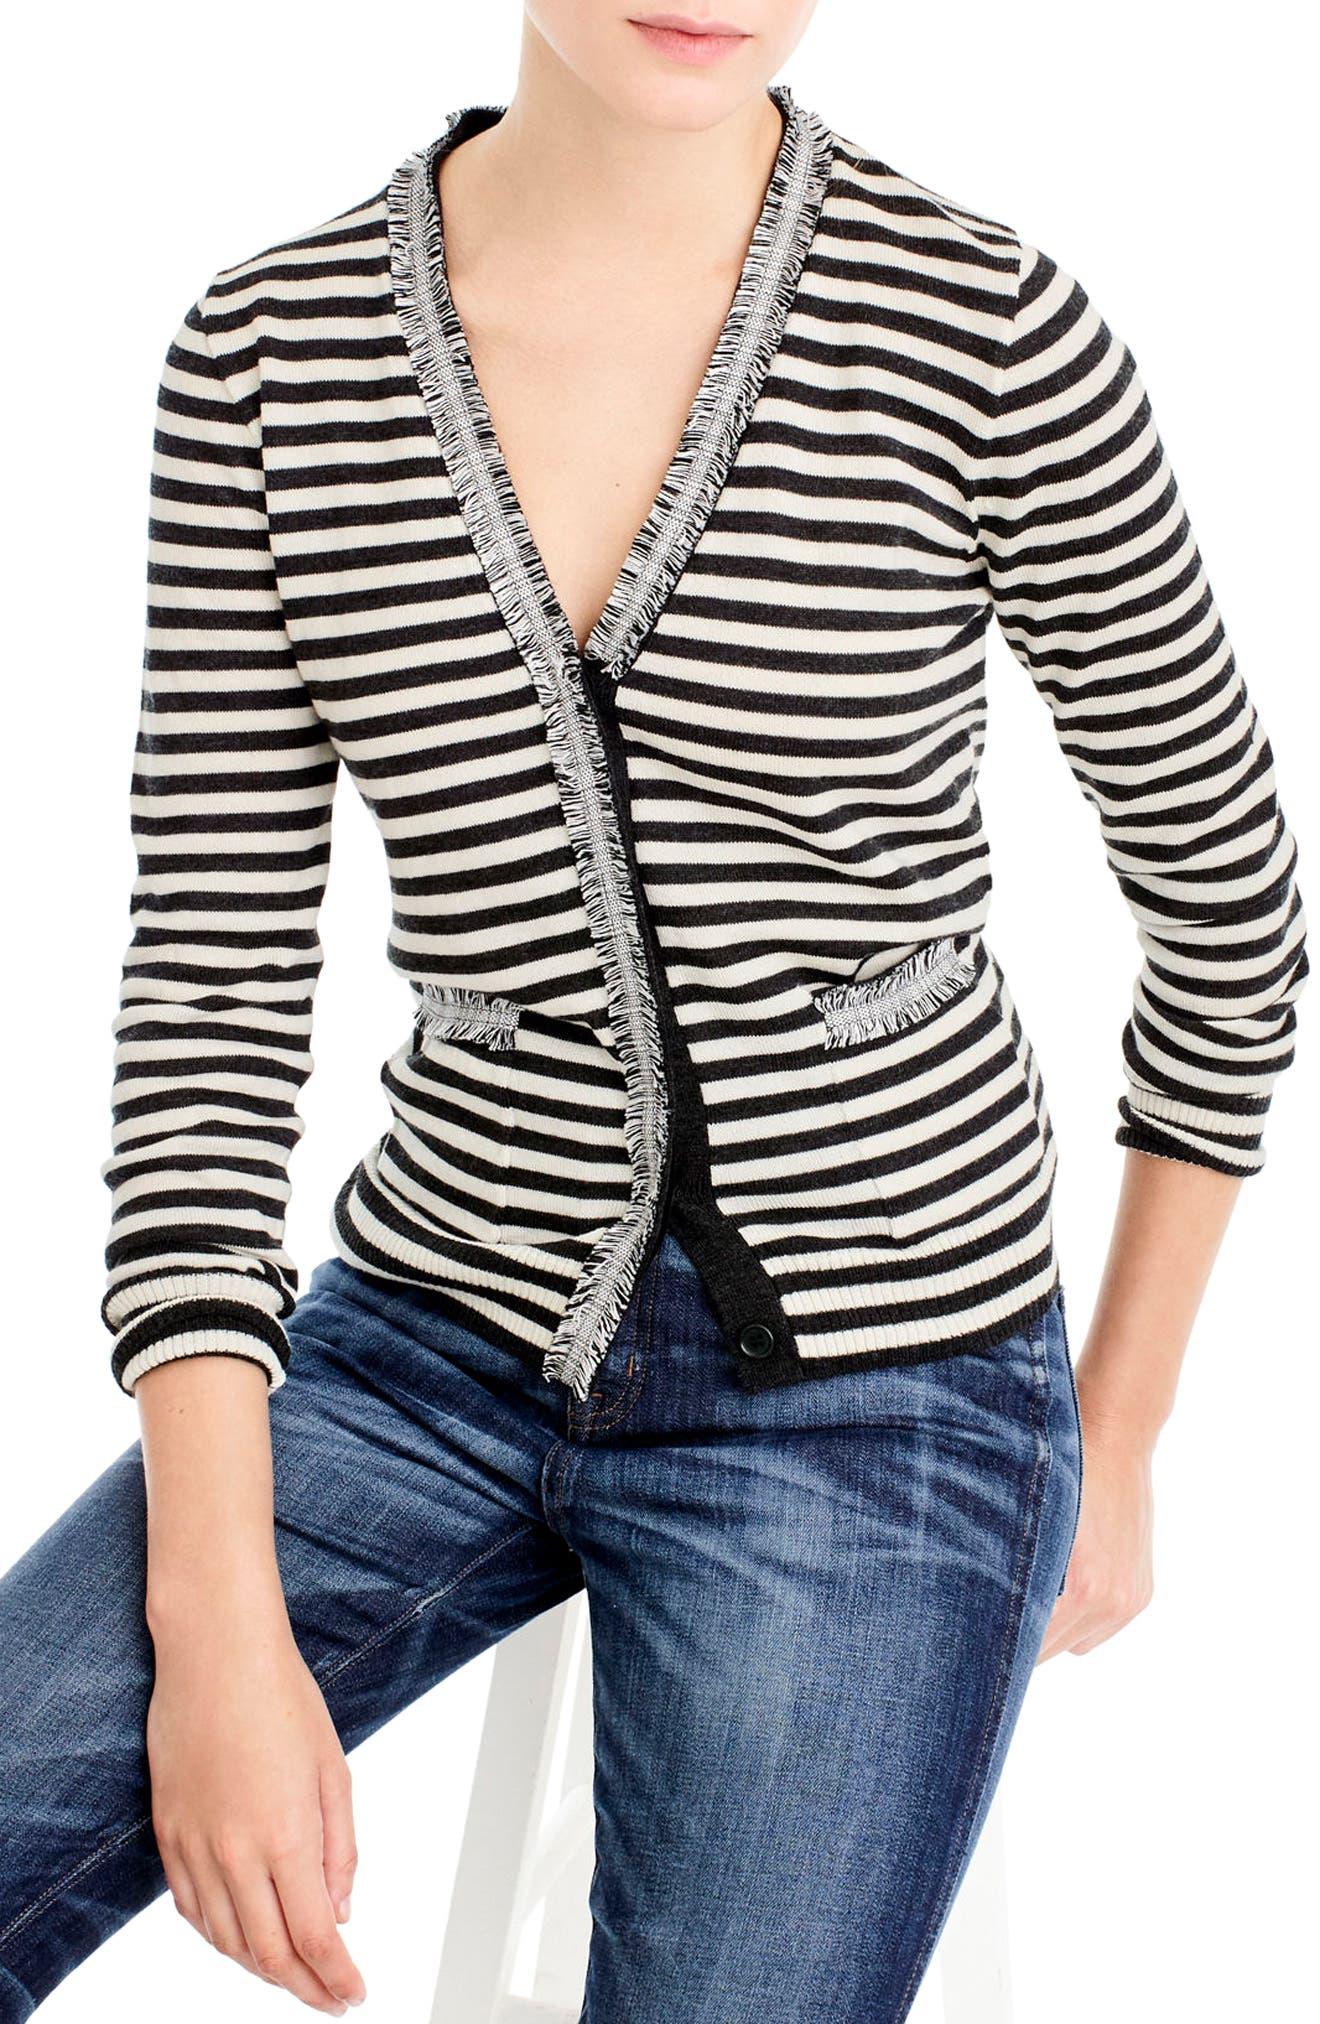 Main Image - J.Crew Stripe Harlow Cardigan Sweater